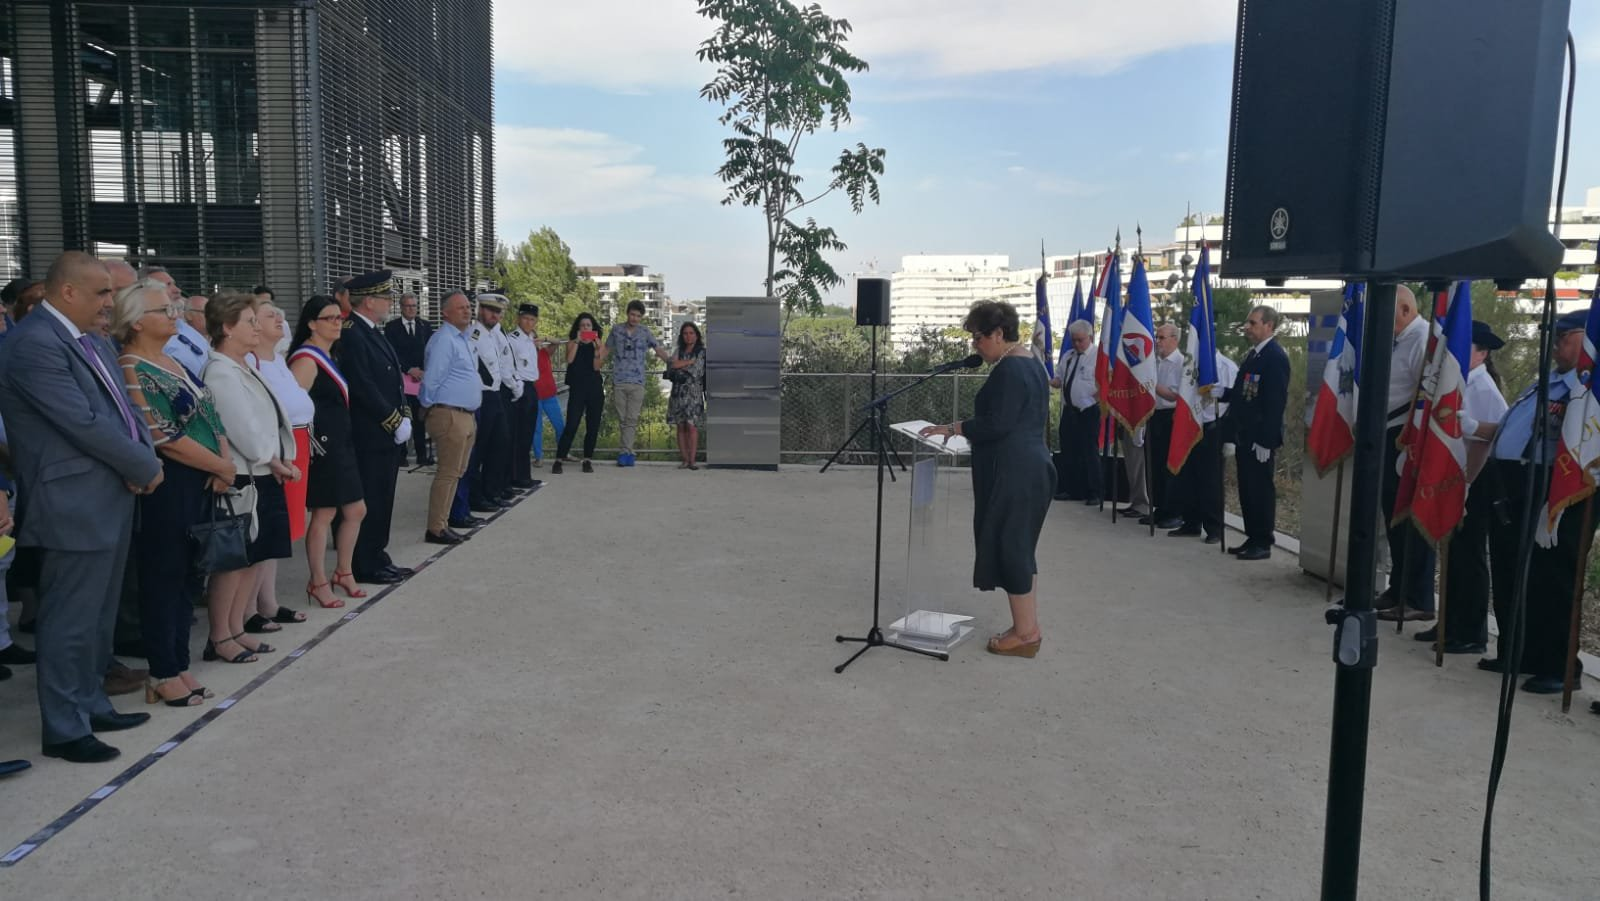 ceremonie vel dhiv MOntpellier 16 juil 2019